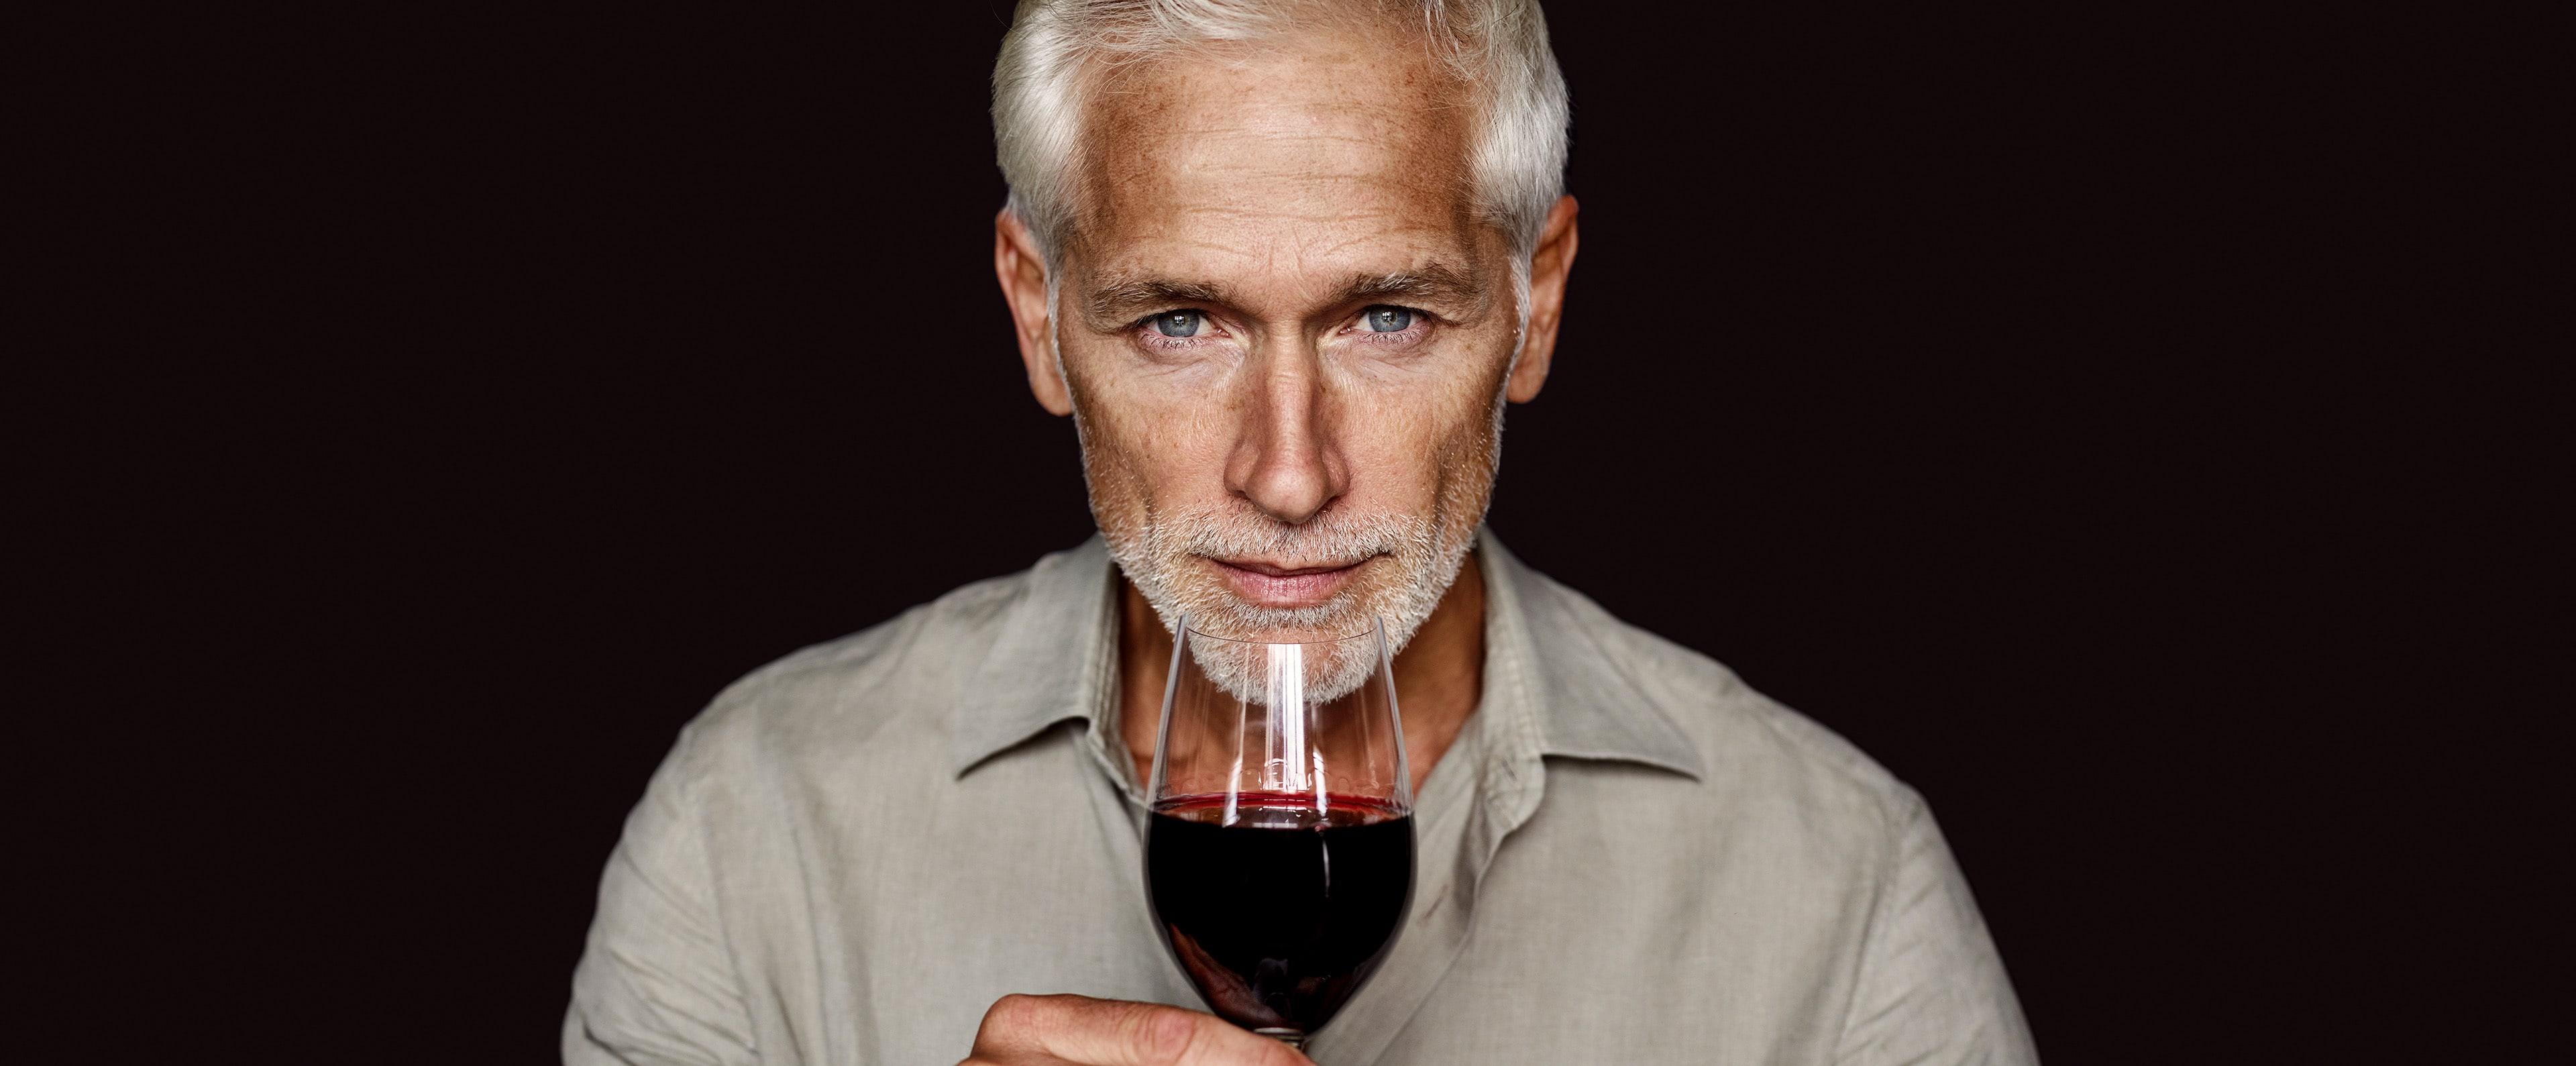 Richard Moran Viniv Wine Bordeaux Lifestyle 025